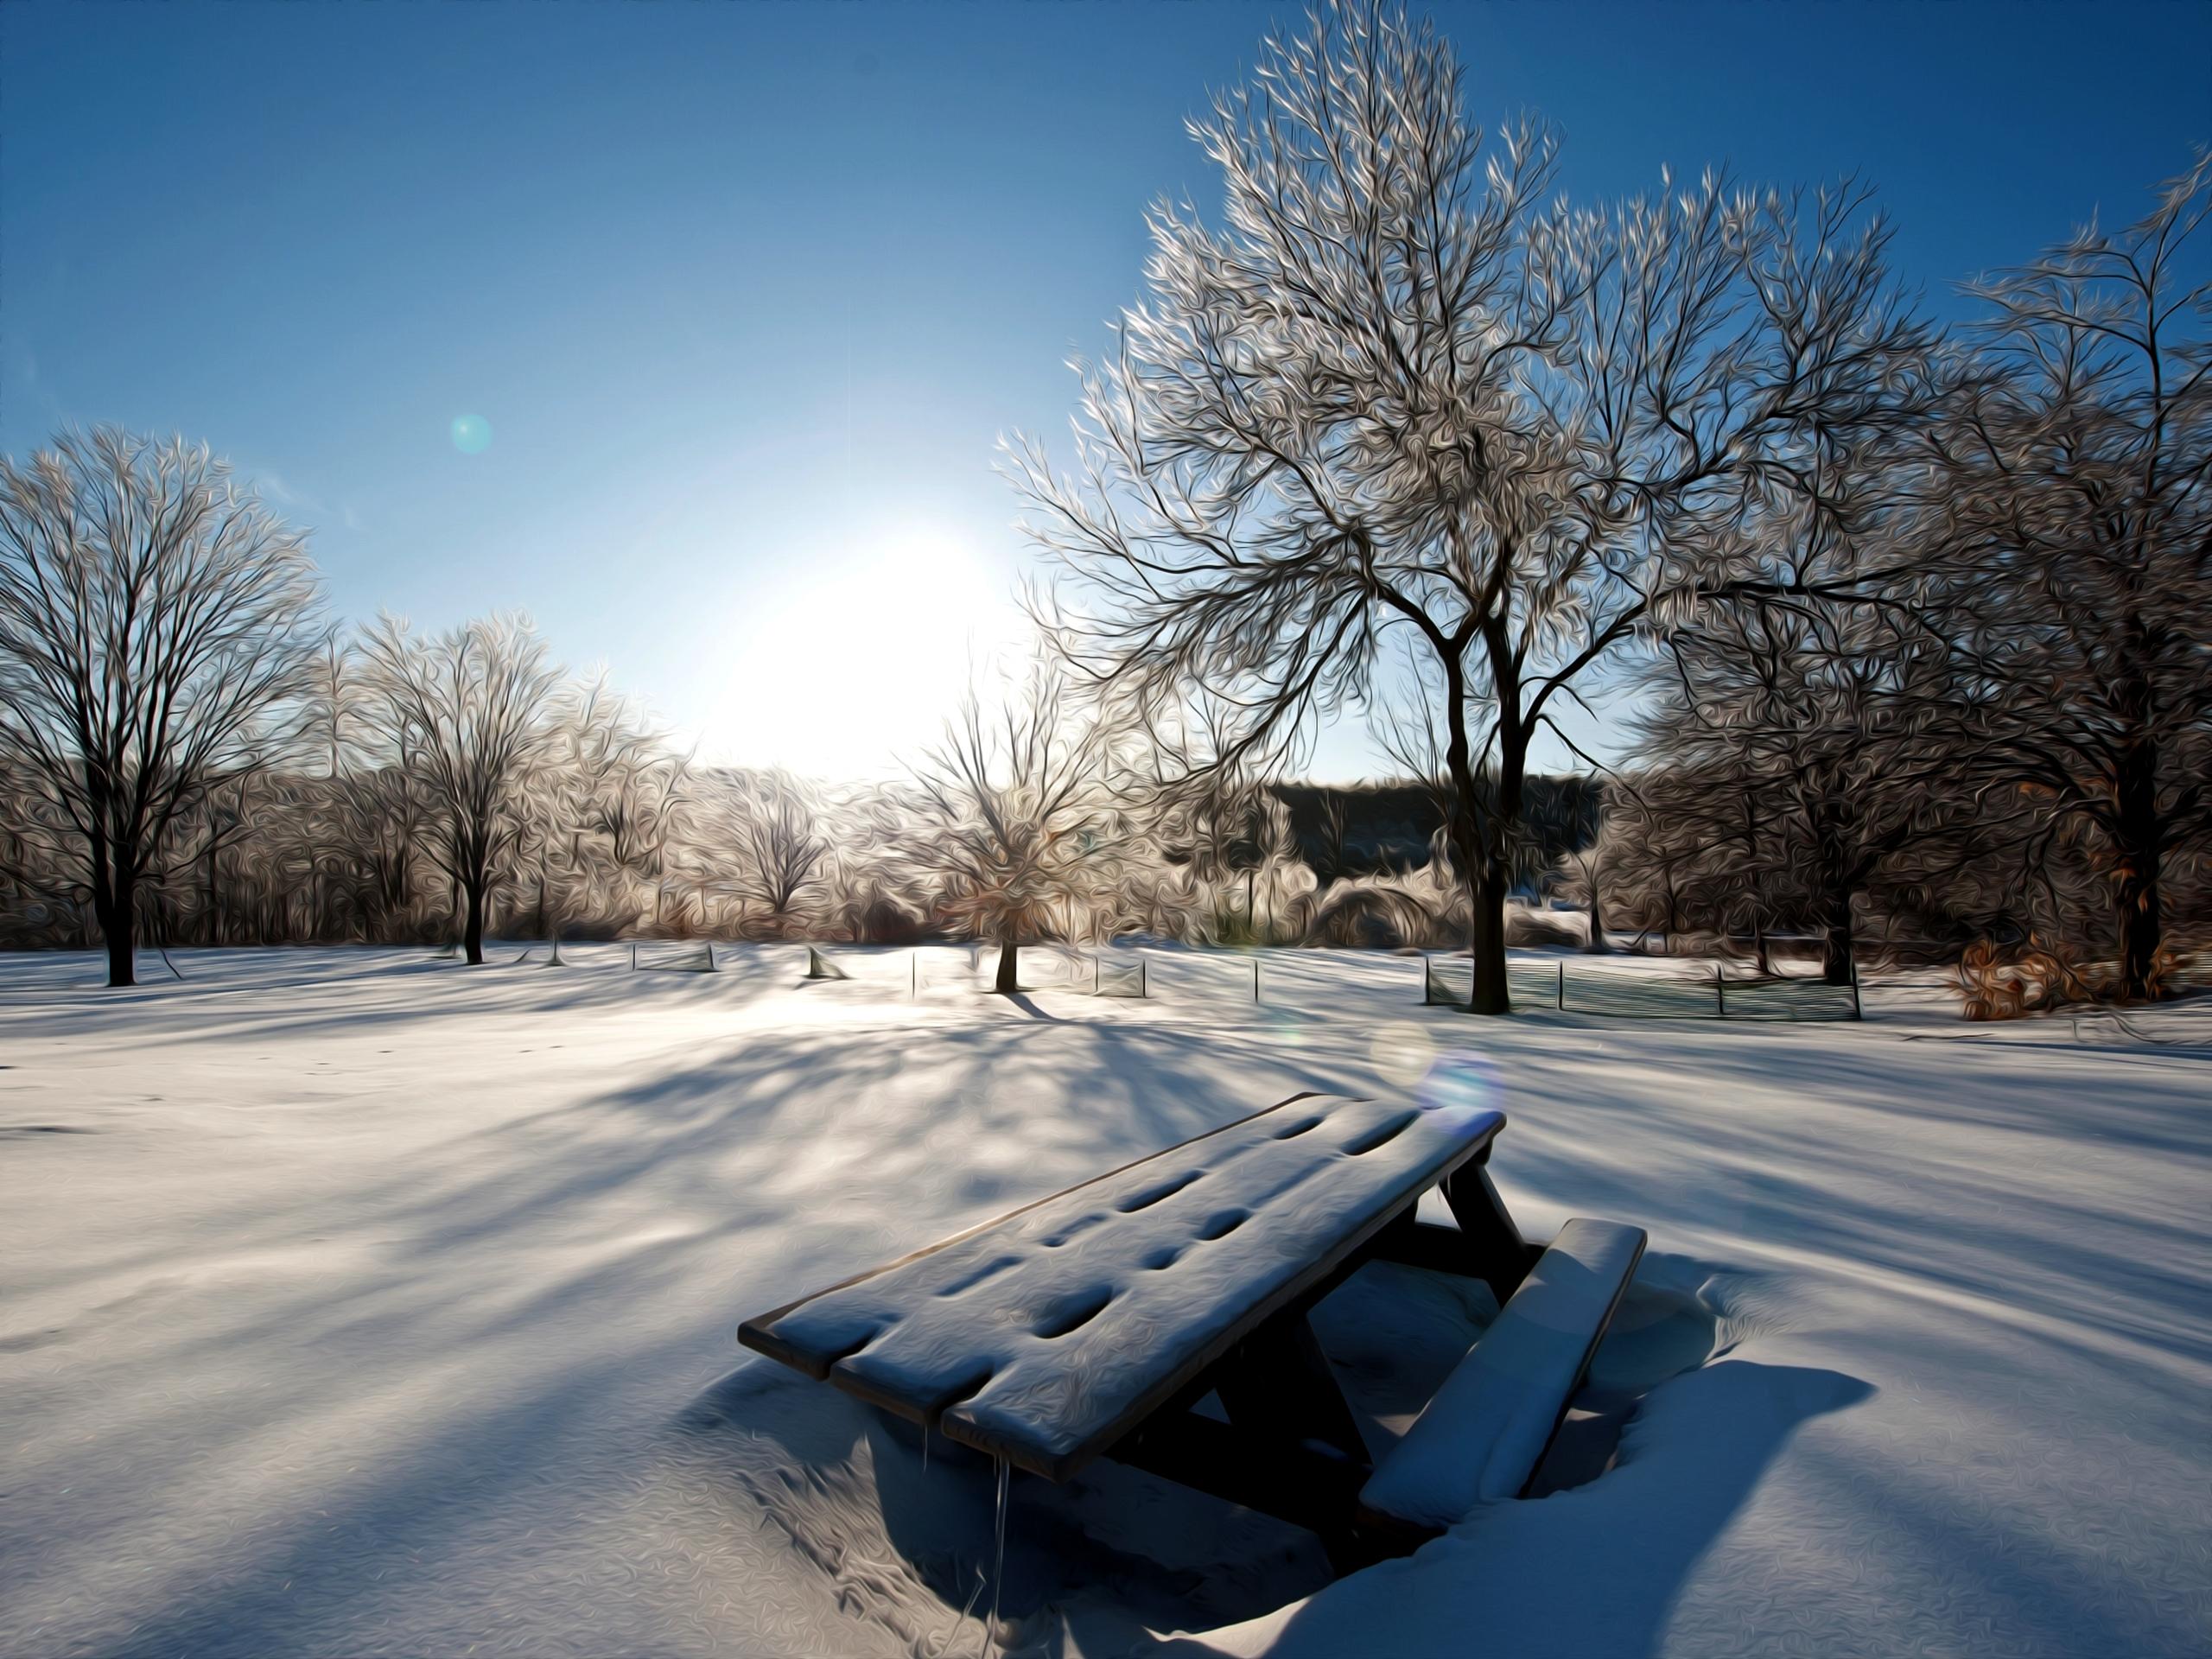 Winter Nature Snow Scene 008jpg 2560x1920